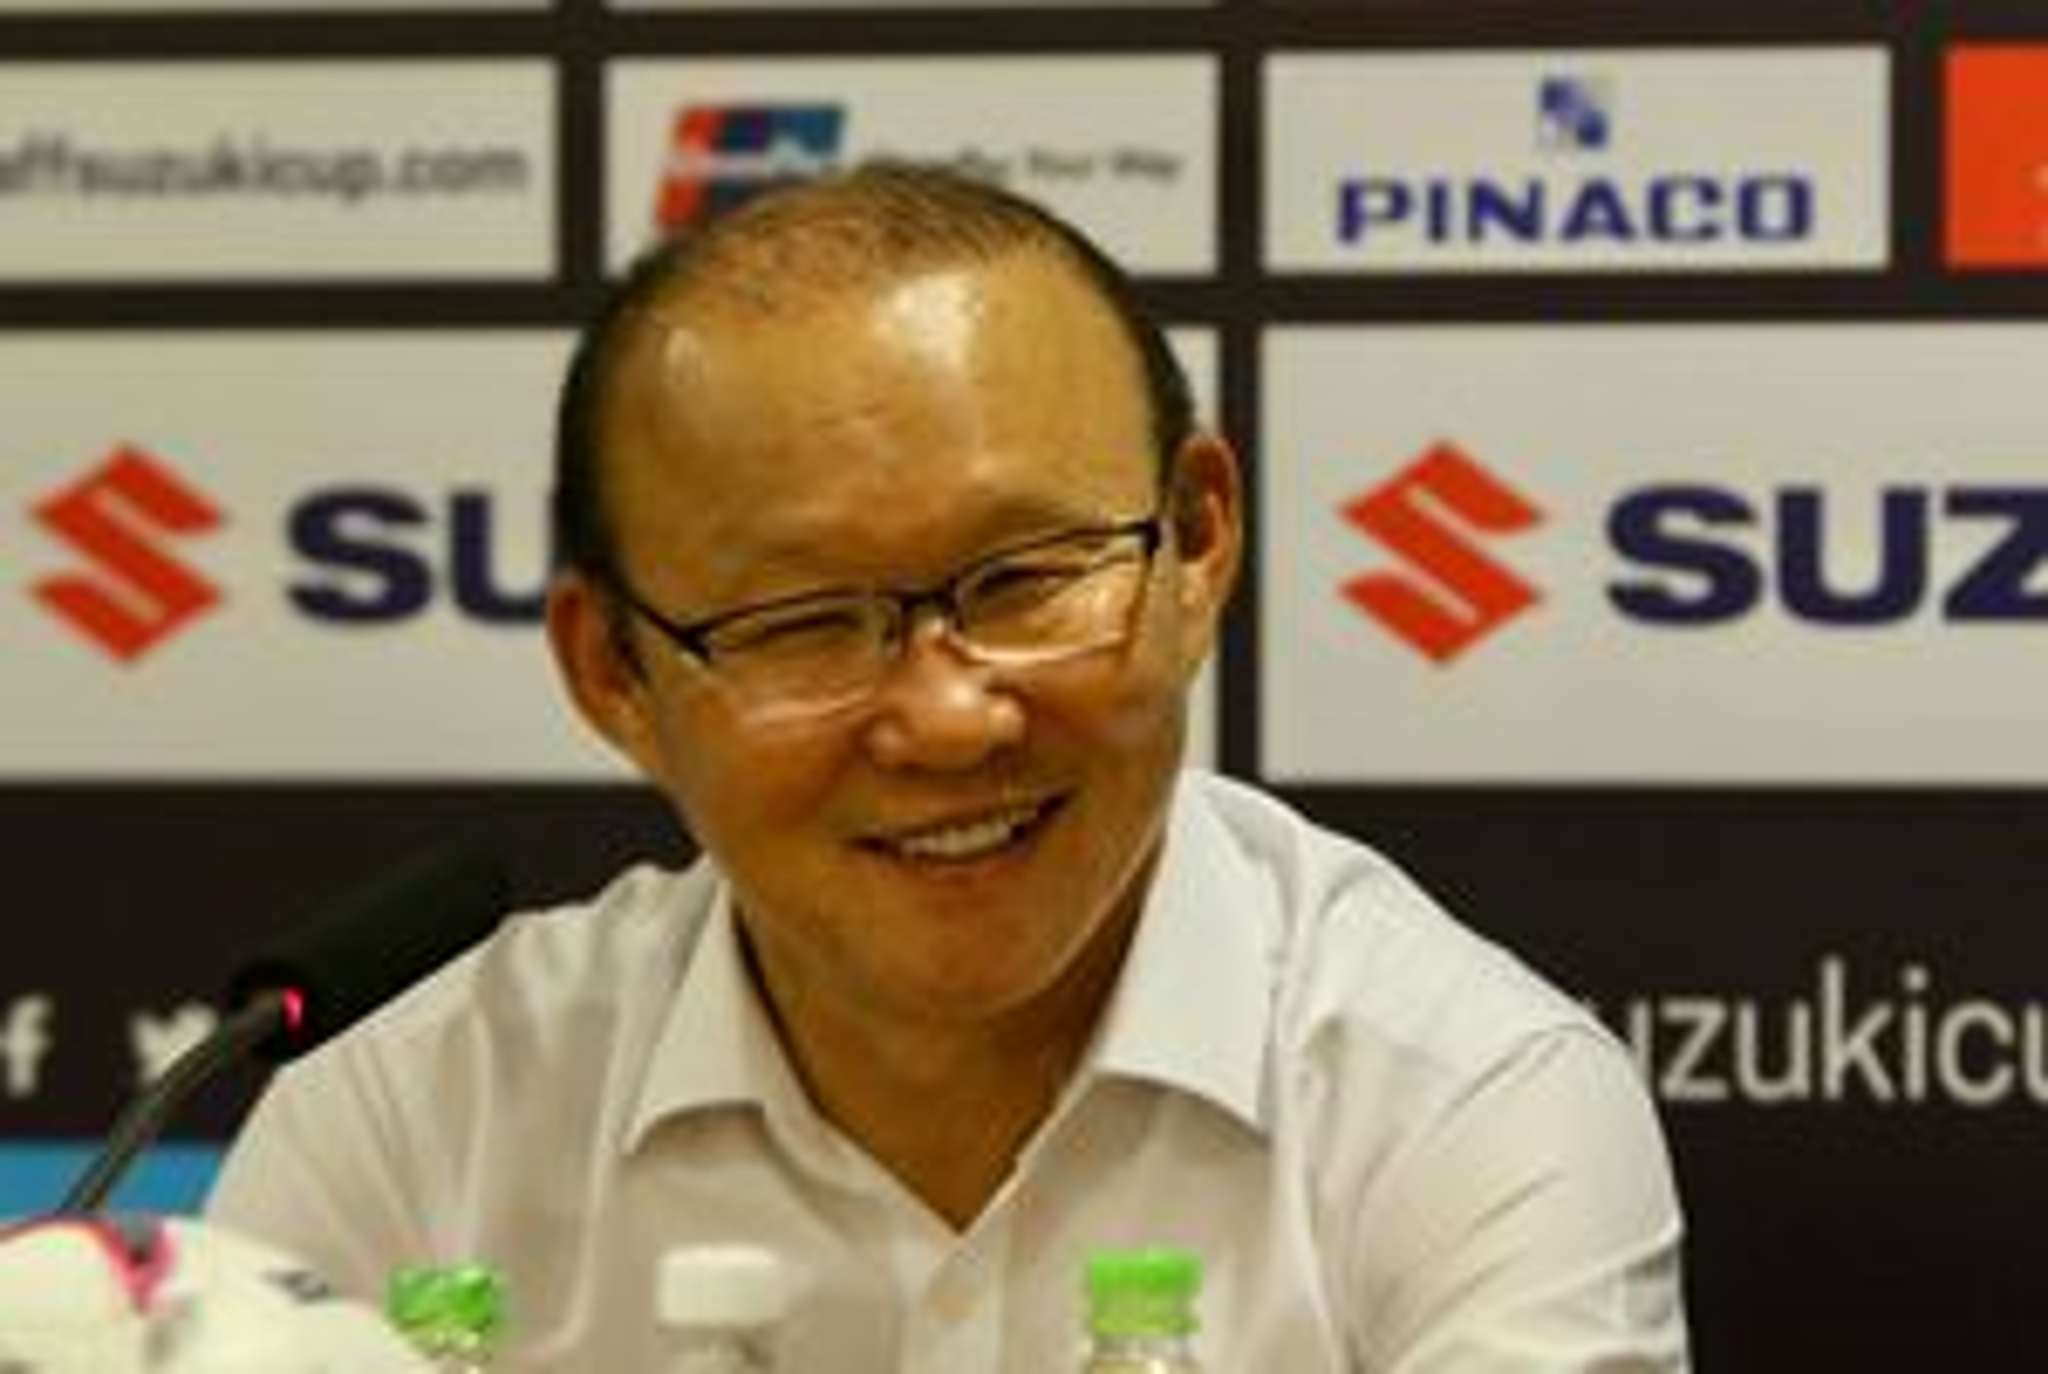 HLV Park Hang-seo tiết lộ bí quyết thắng Philippines